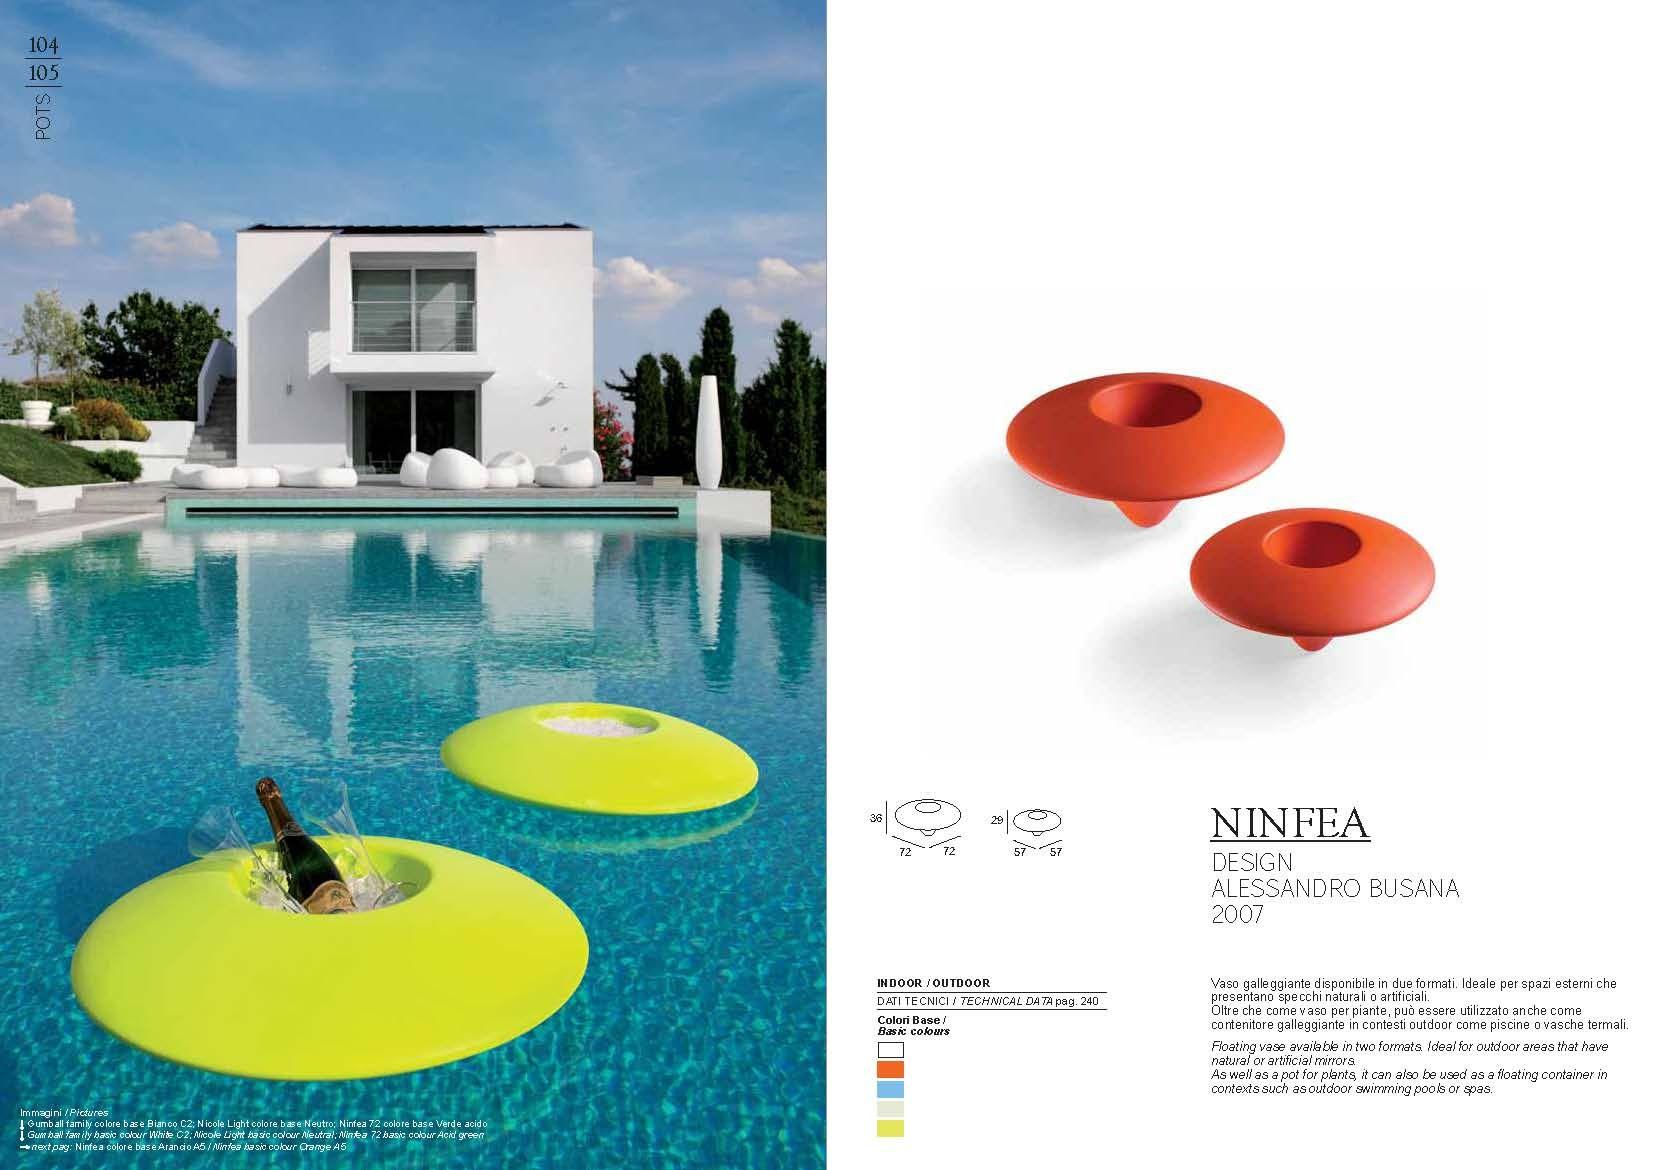 gartenm bel pot plust collection serie ninfeadie m bel aus italien. Black Bedroom Furniture Sets. Home Design Ideas